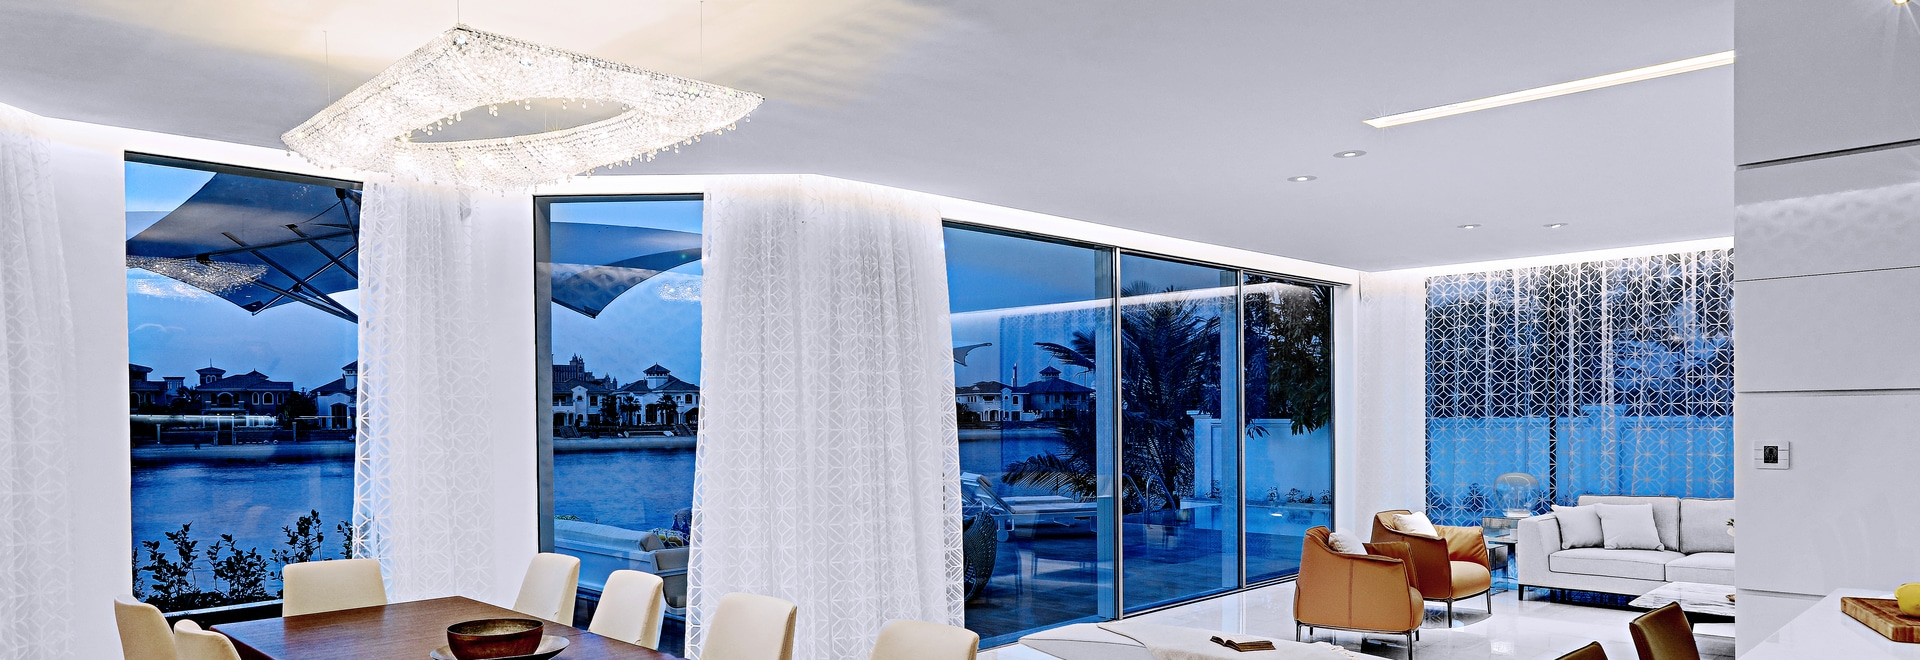 Artikoi crystal chandelier in Dubai